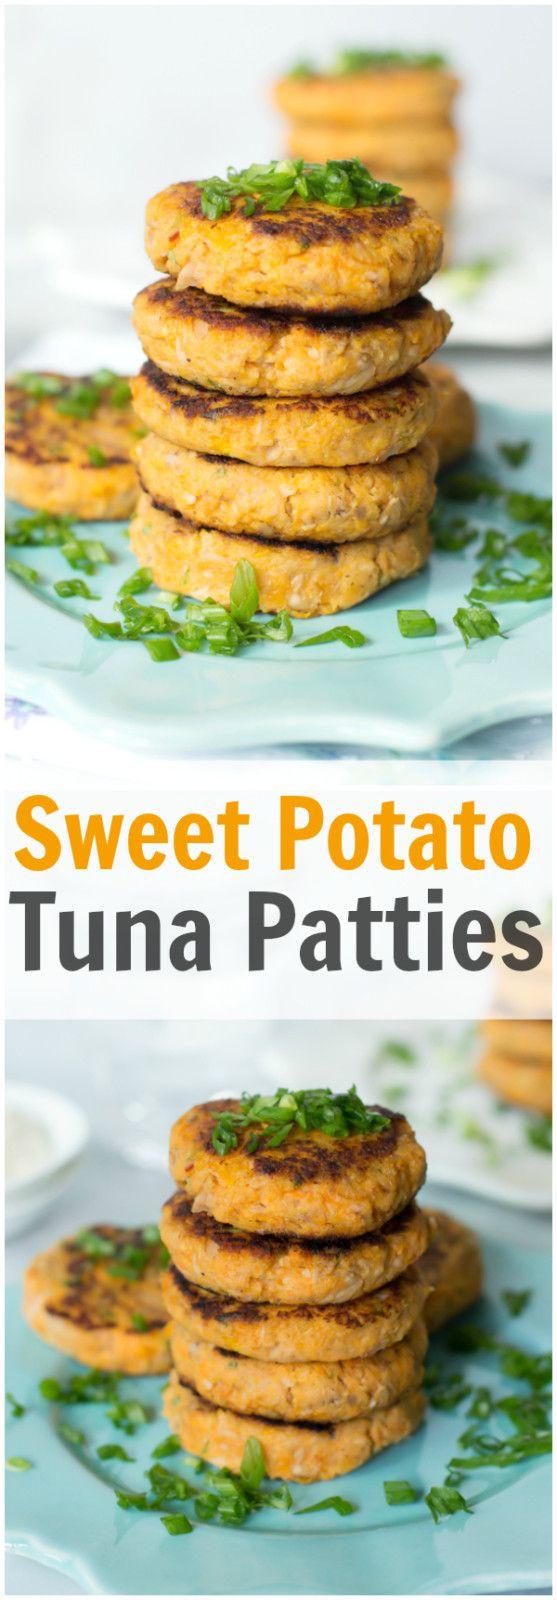 ... about Tuna Patties on Pinterest | Tuna, Salmon cakes and Tuna cakes